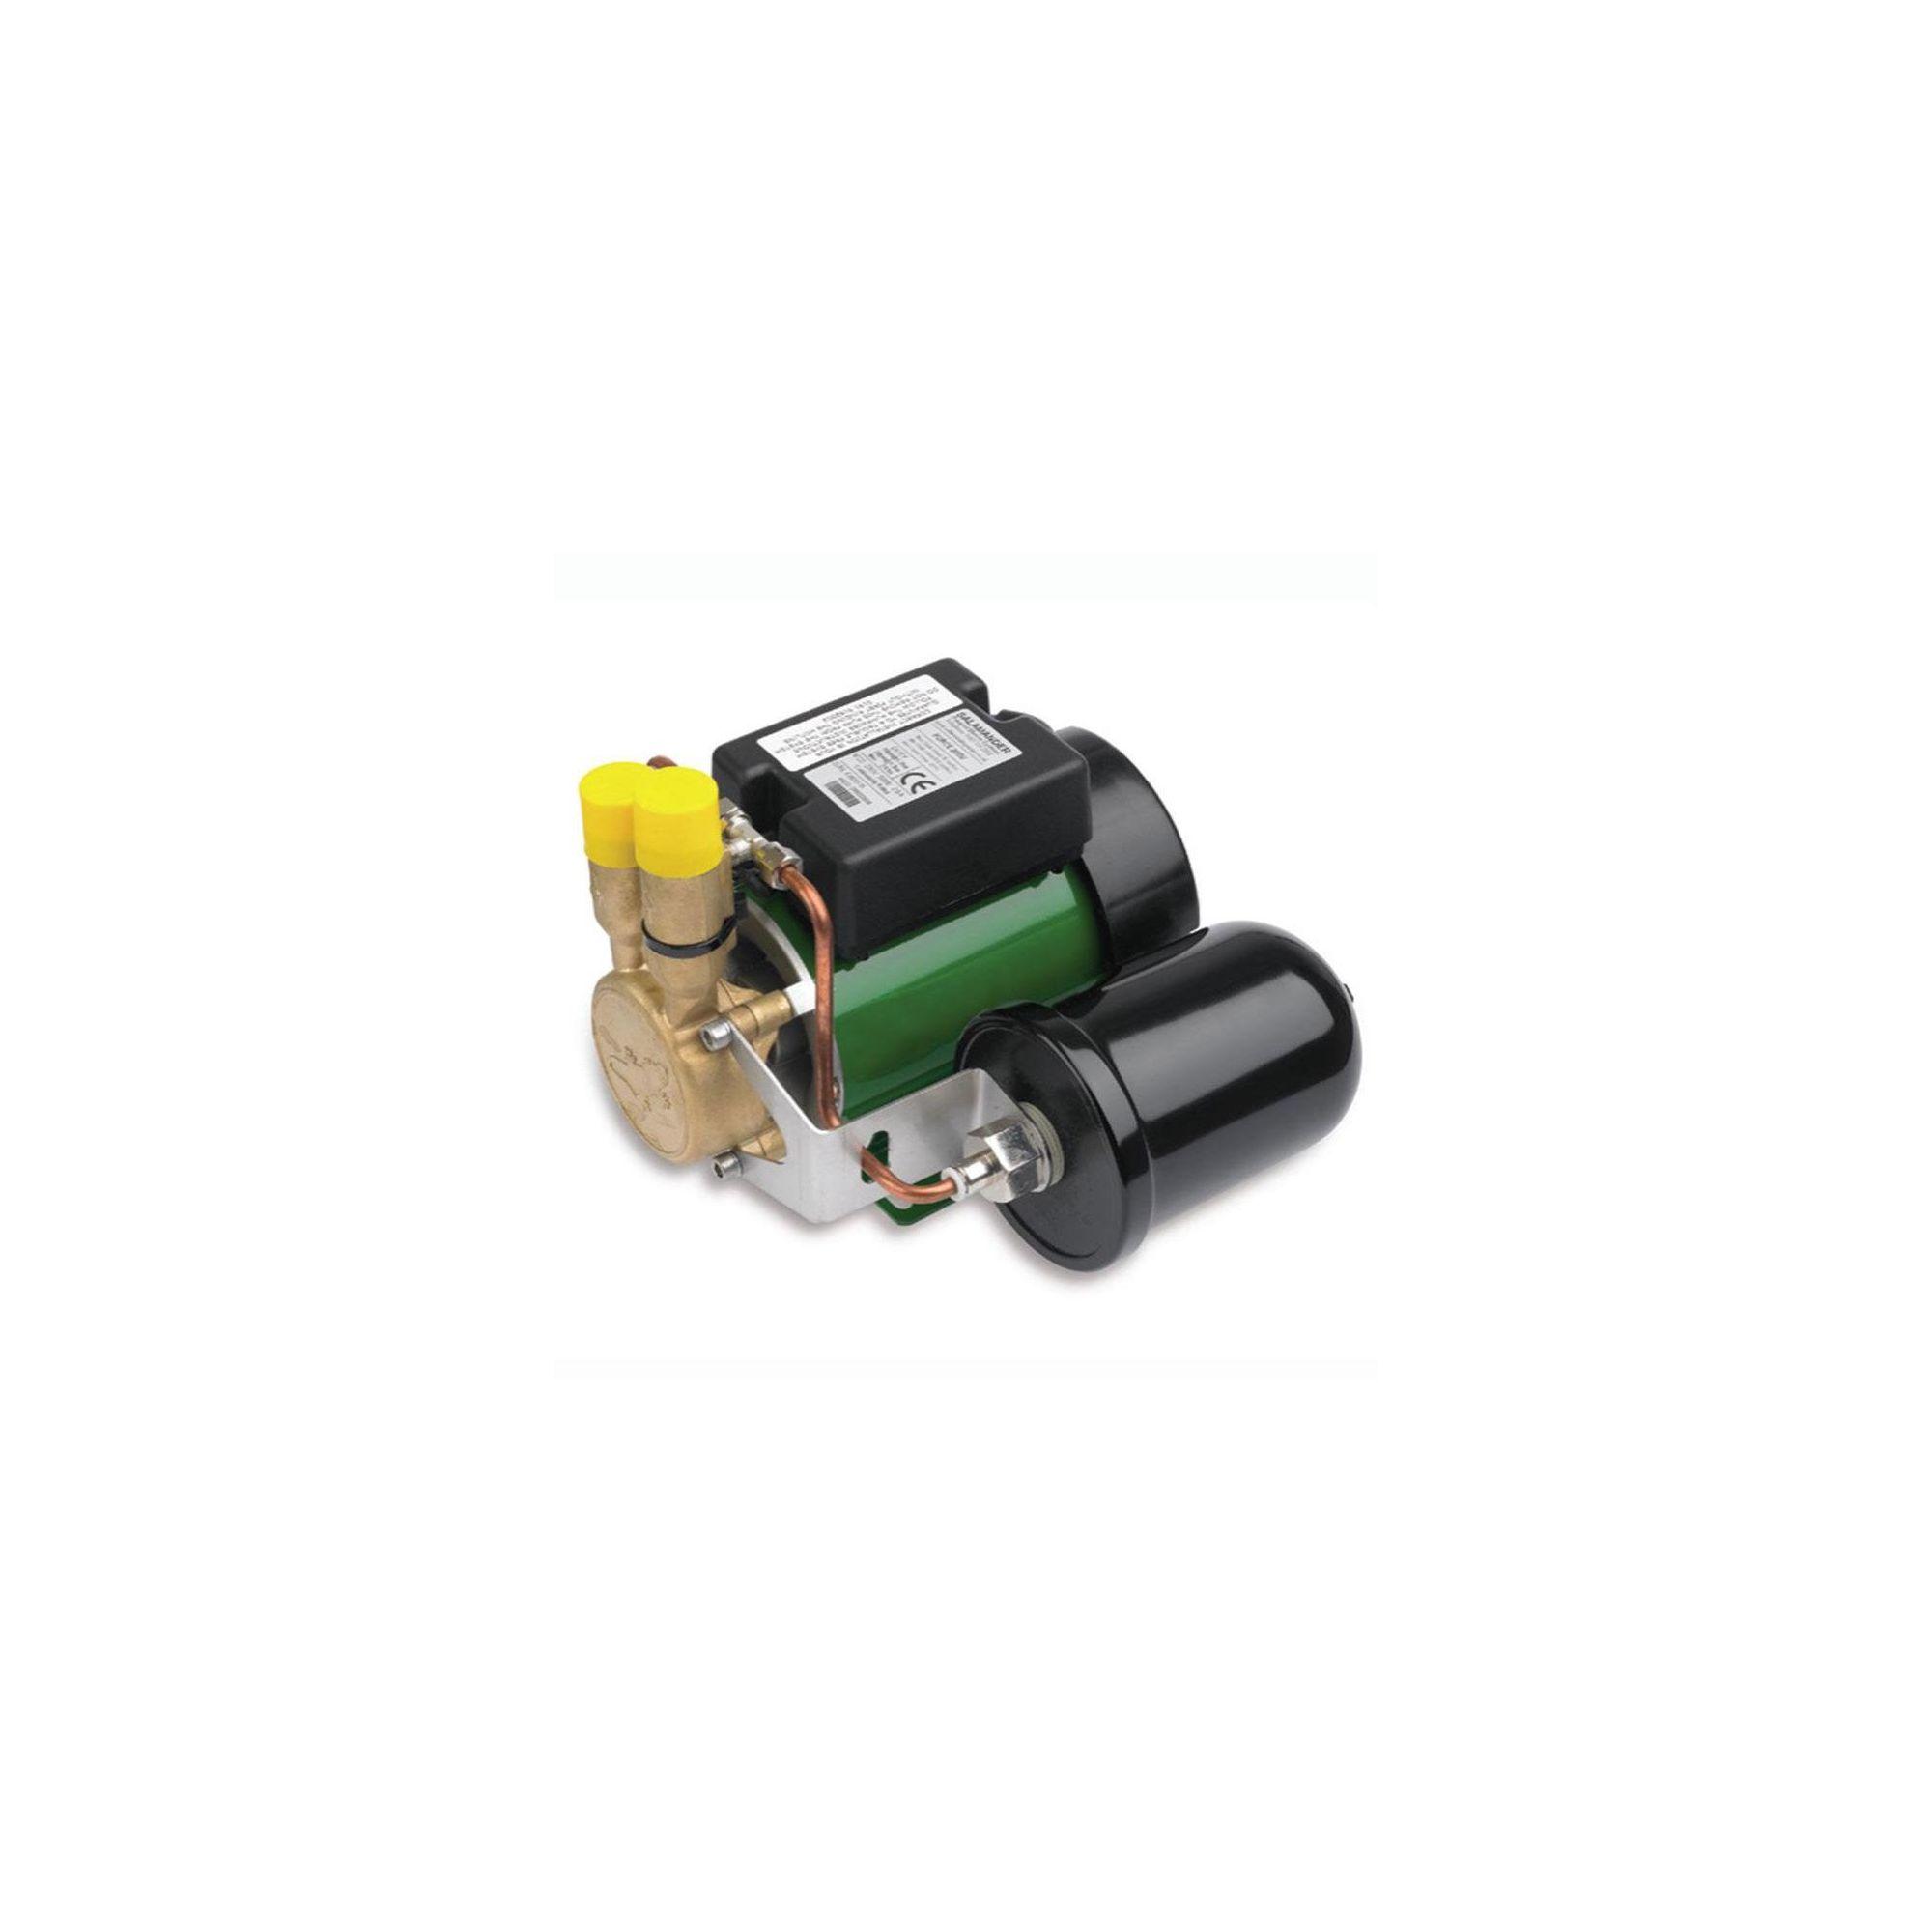 Salamander Force 30 SU Universal Single Impeller Shower Pump, Positive or Negative Head, 3.0 Bar at Tescos Direct